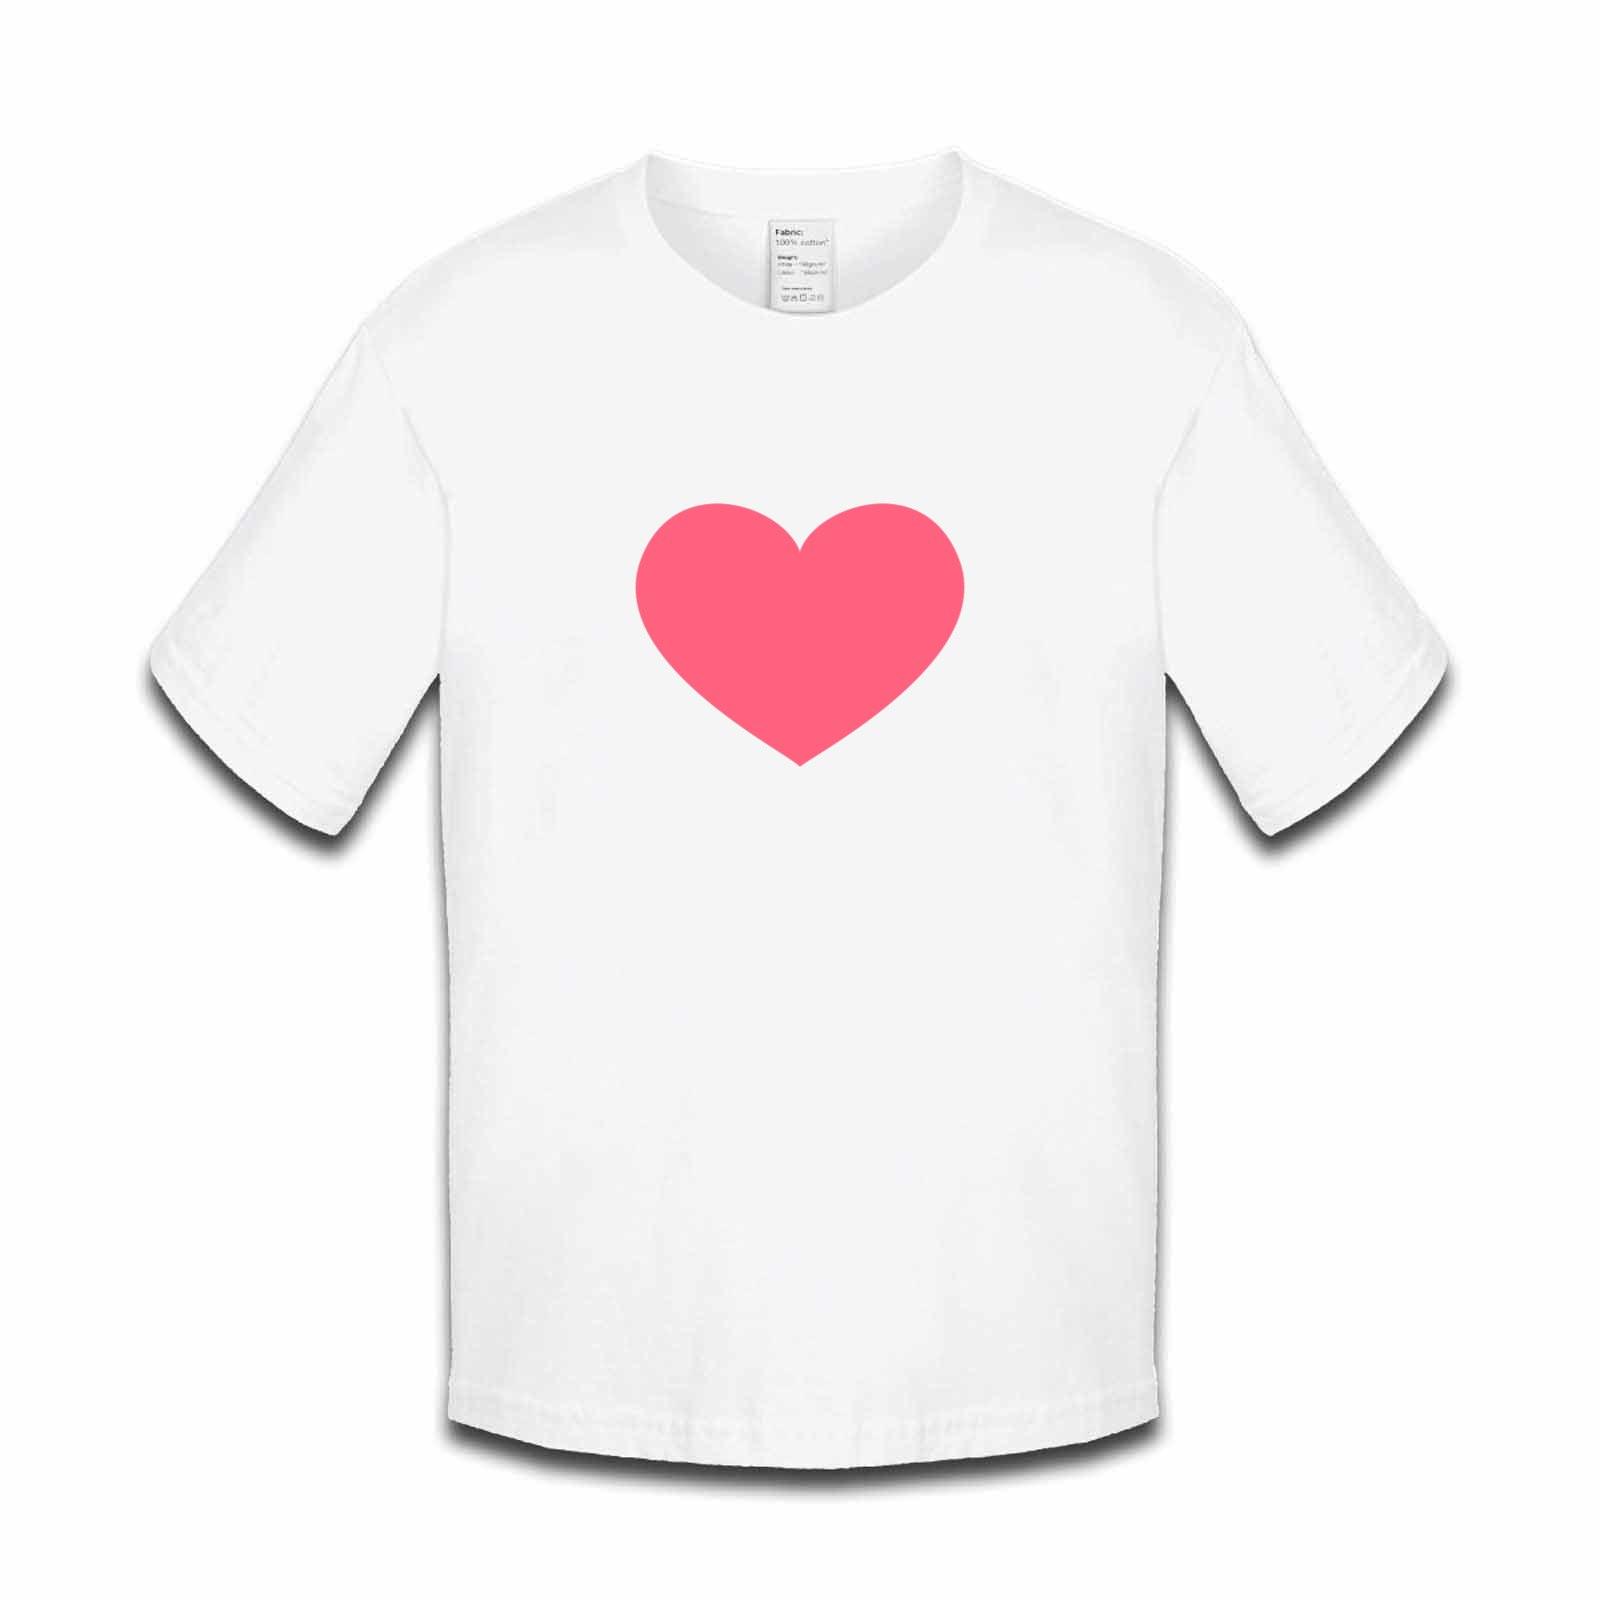 035add1b6223 Emoji Heavy Black Heart Girls Tshirt. Available in many colours ...